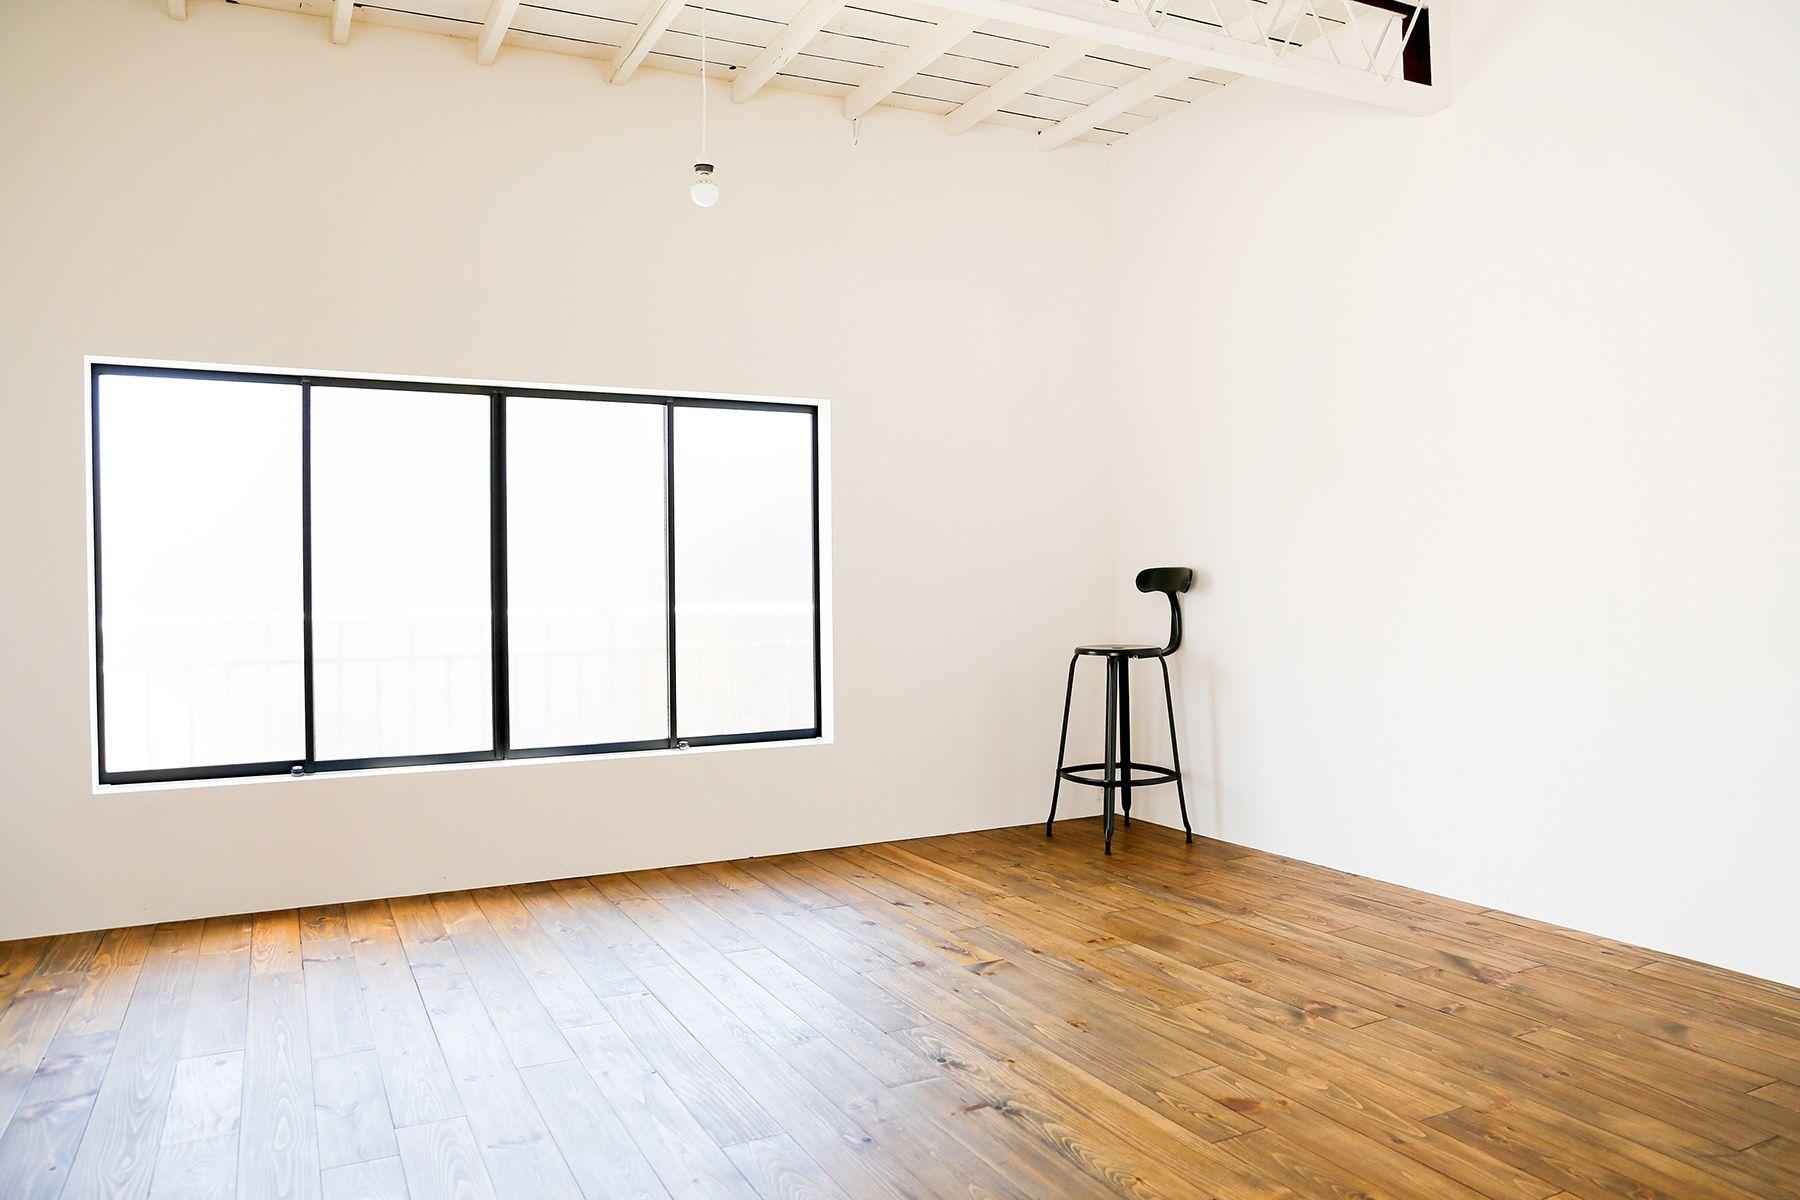 studio PEANUTS (スタジオ ピーナッツ)1F/安定した優しい光が回ります